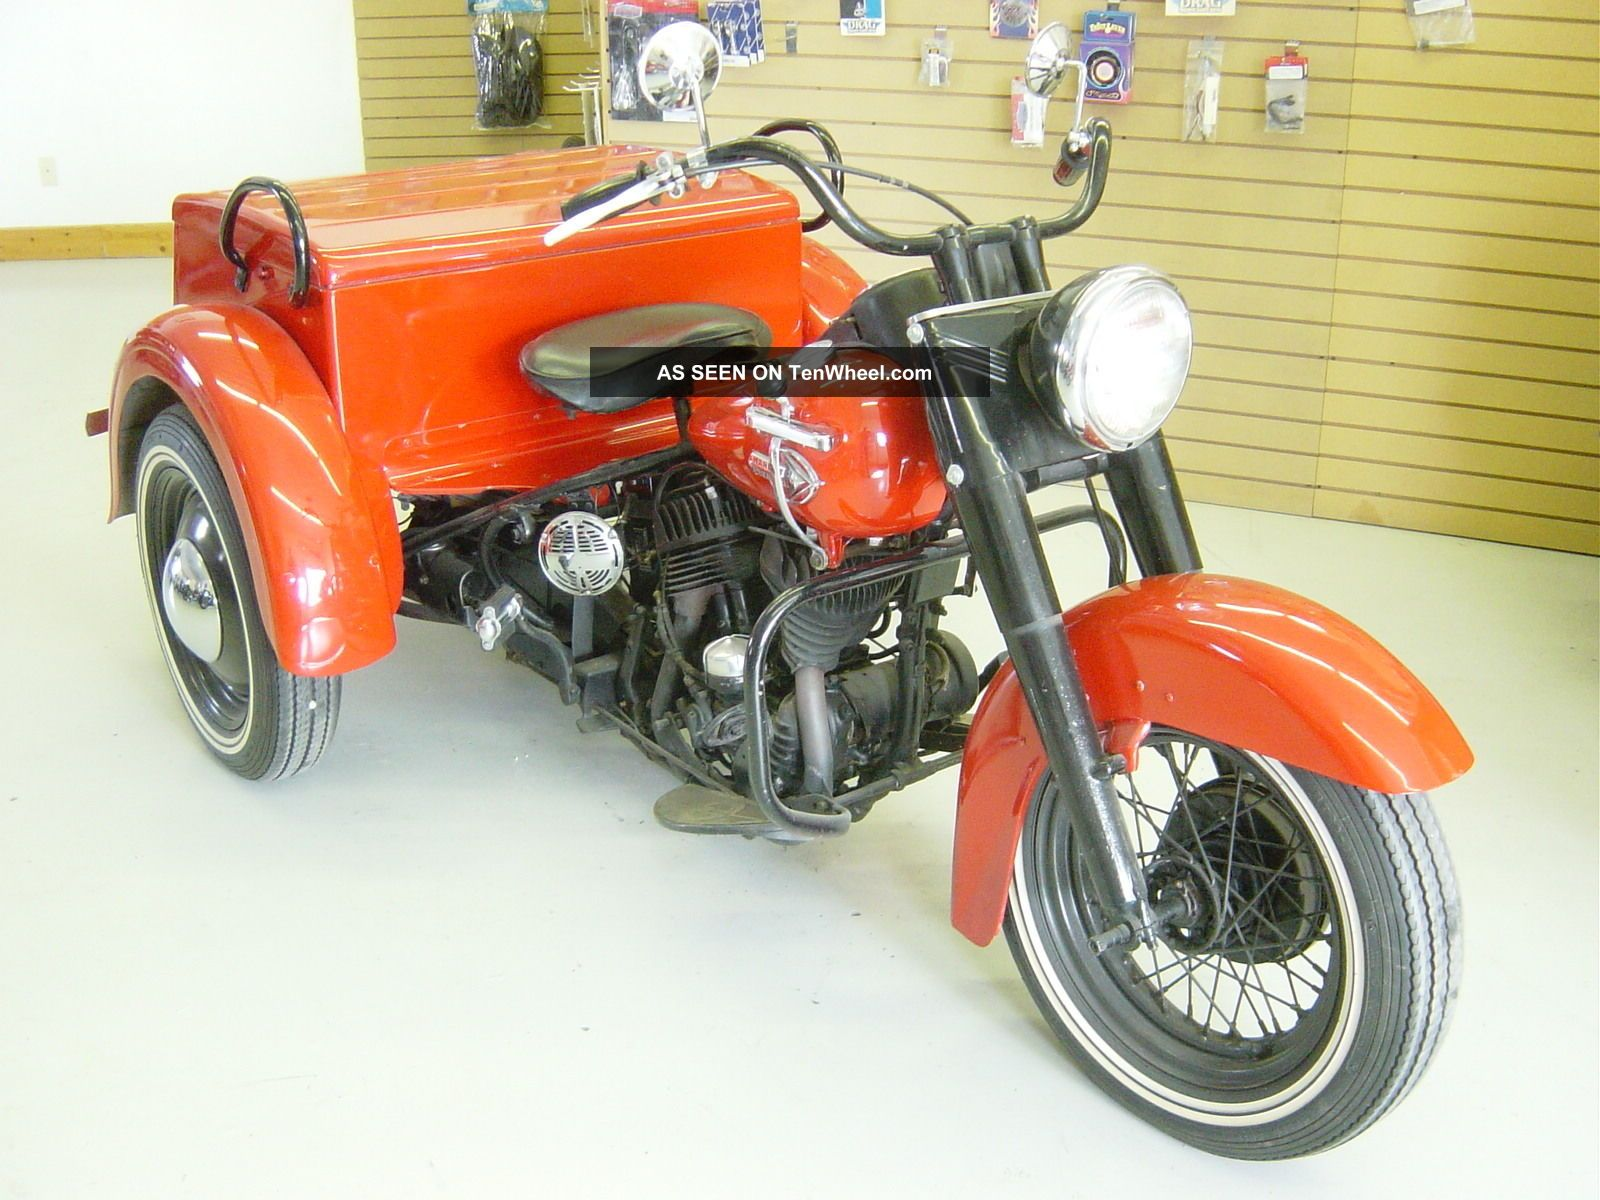 1959 Red Harley Davidson Servi - Car 45 Ci Trike Police Metermaid ...